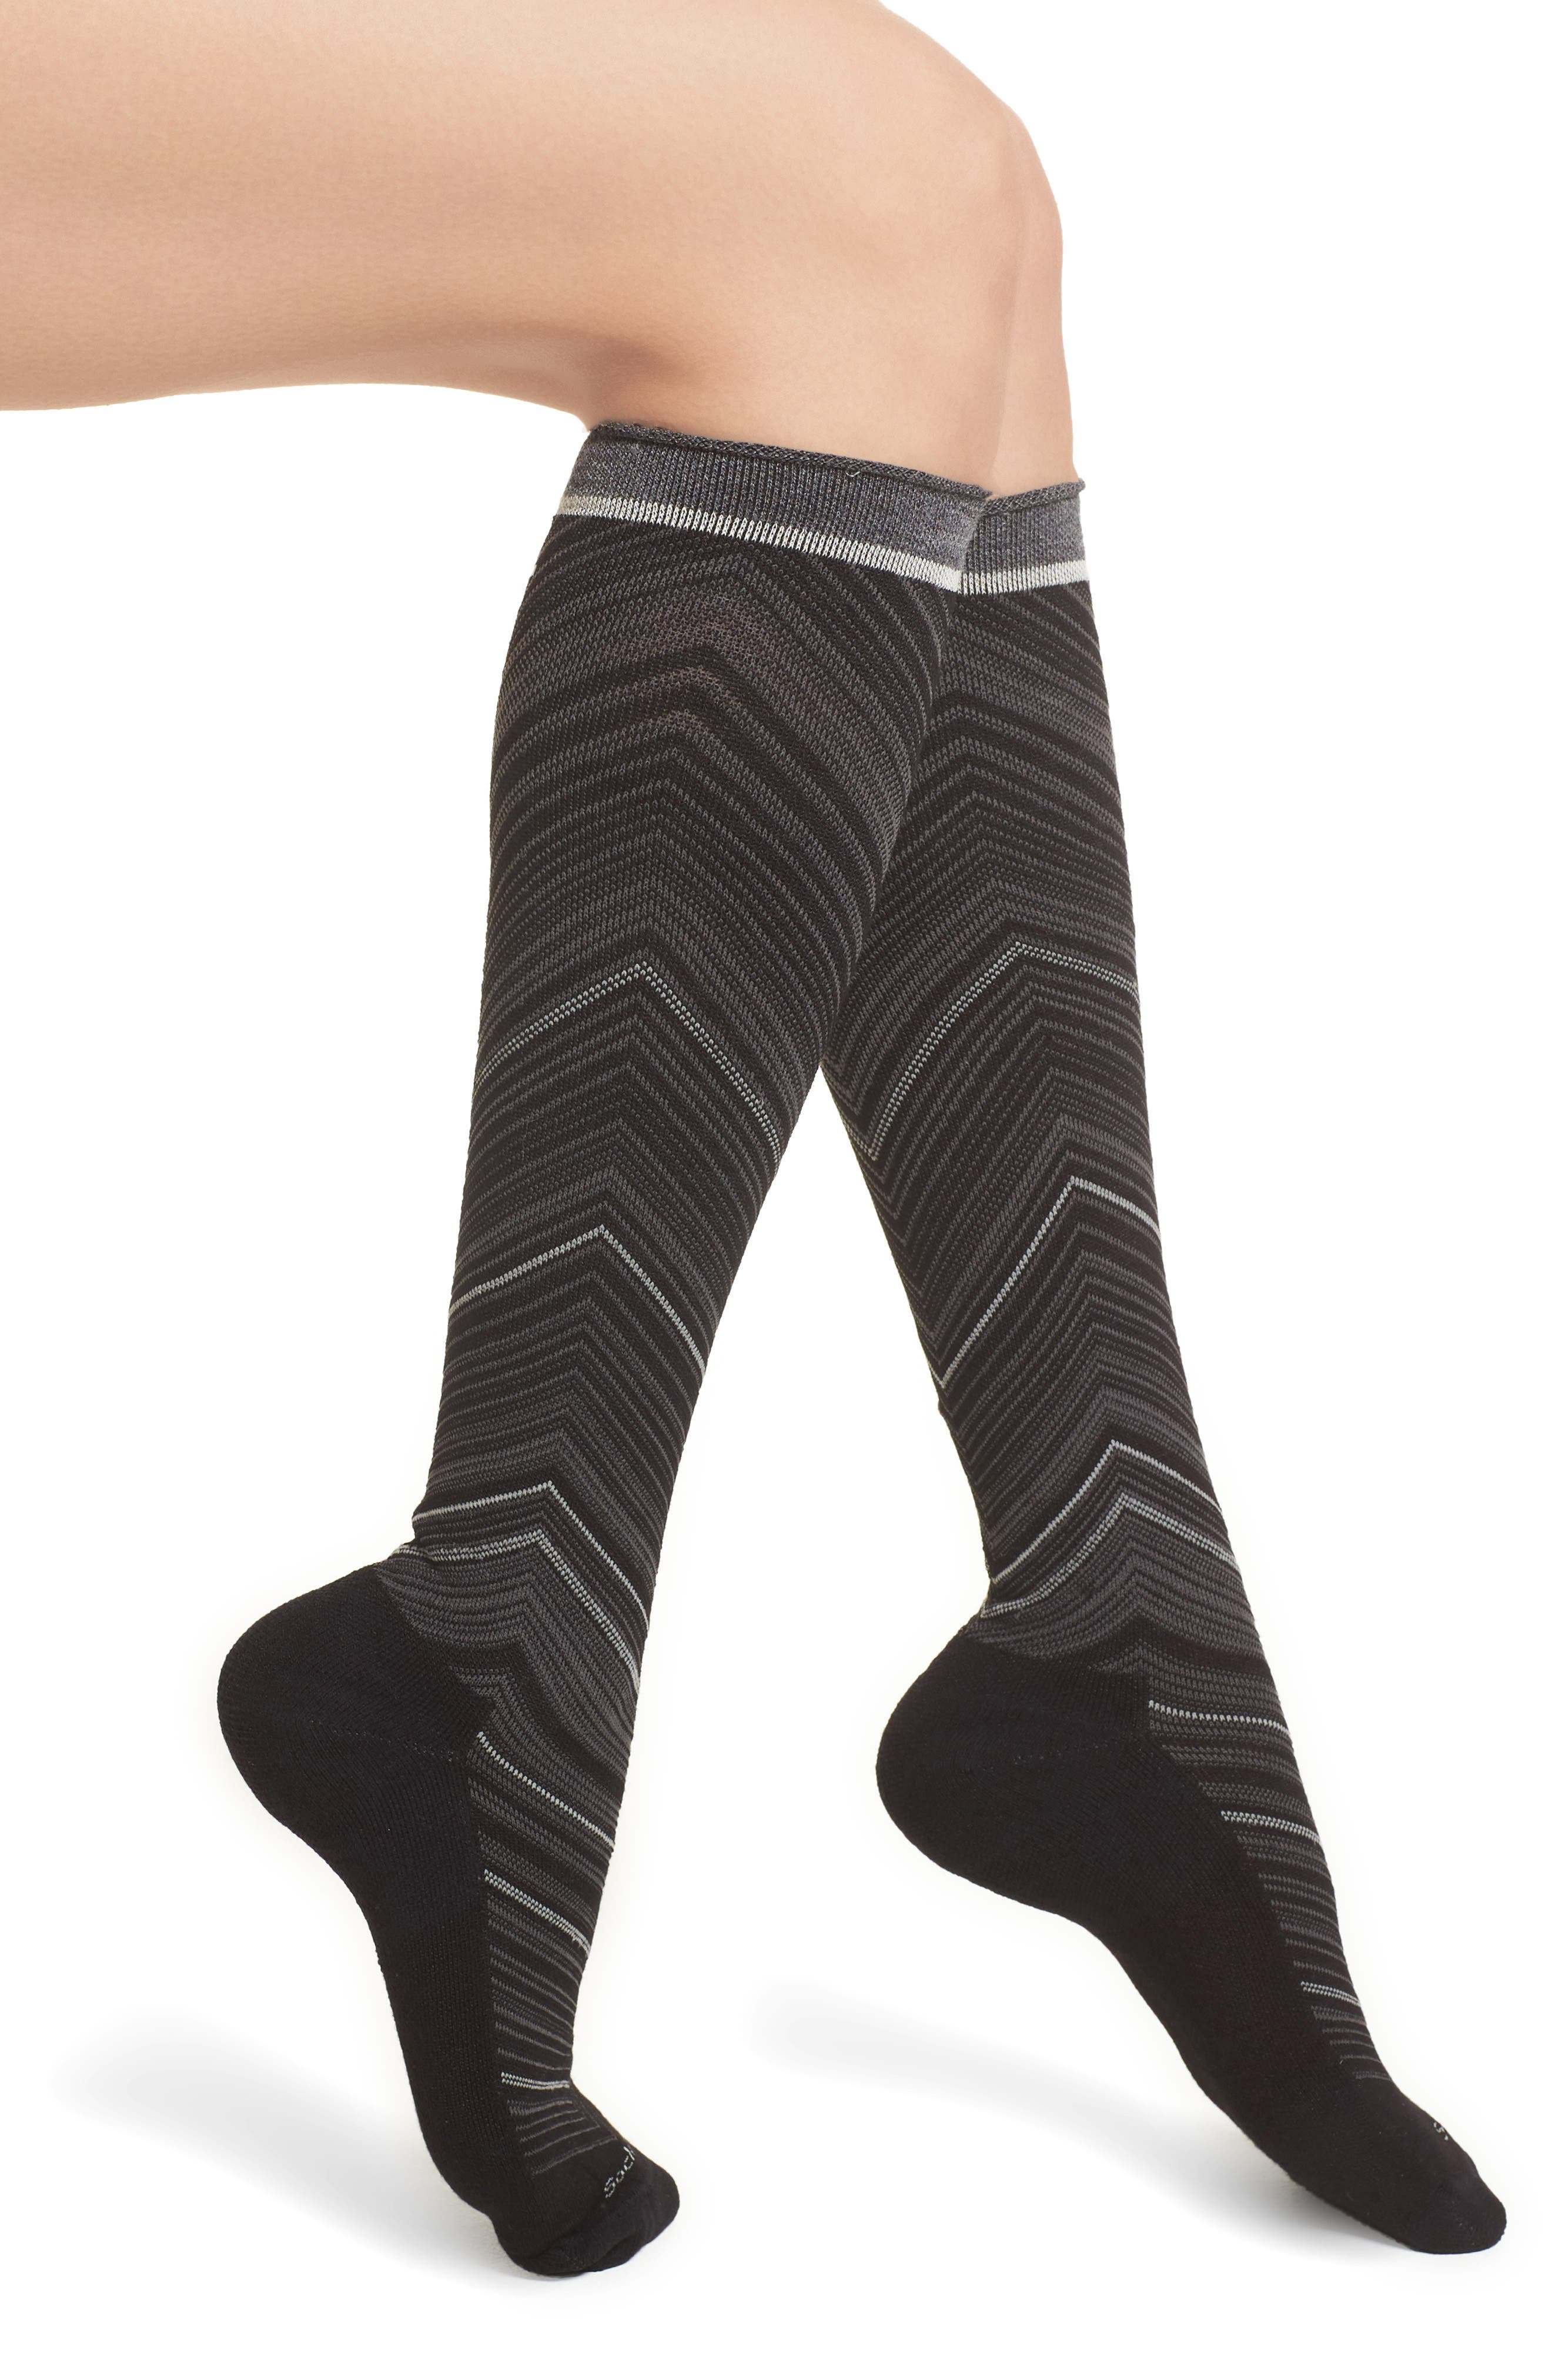 Full Calf Flattery Compression Socks,                         Main,                         color,